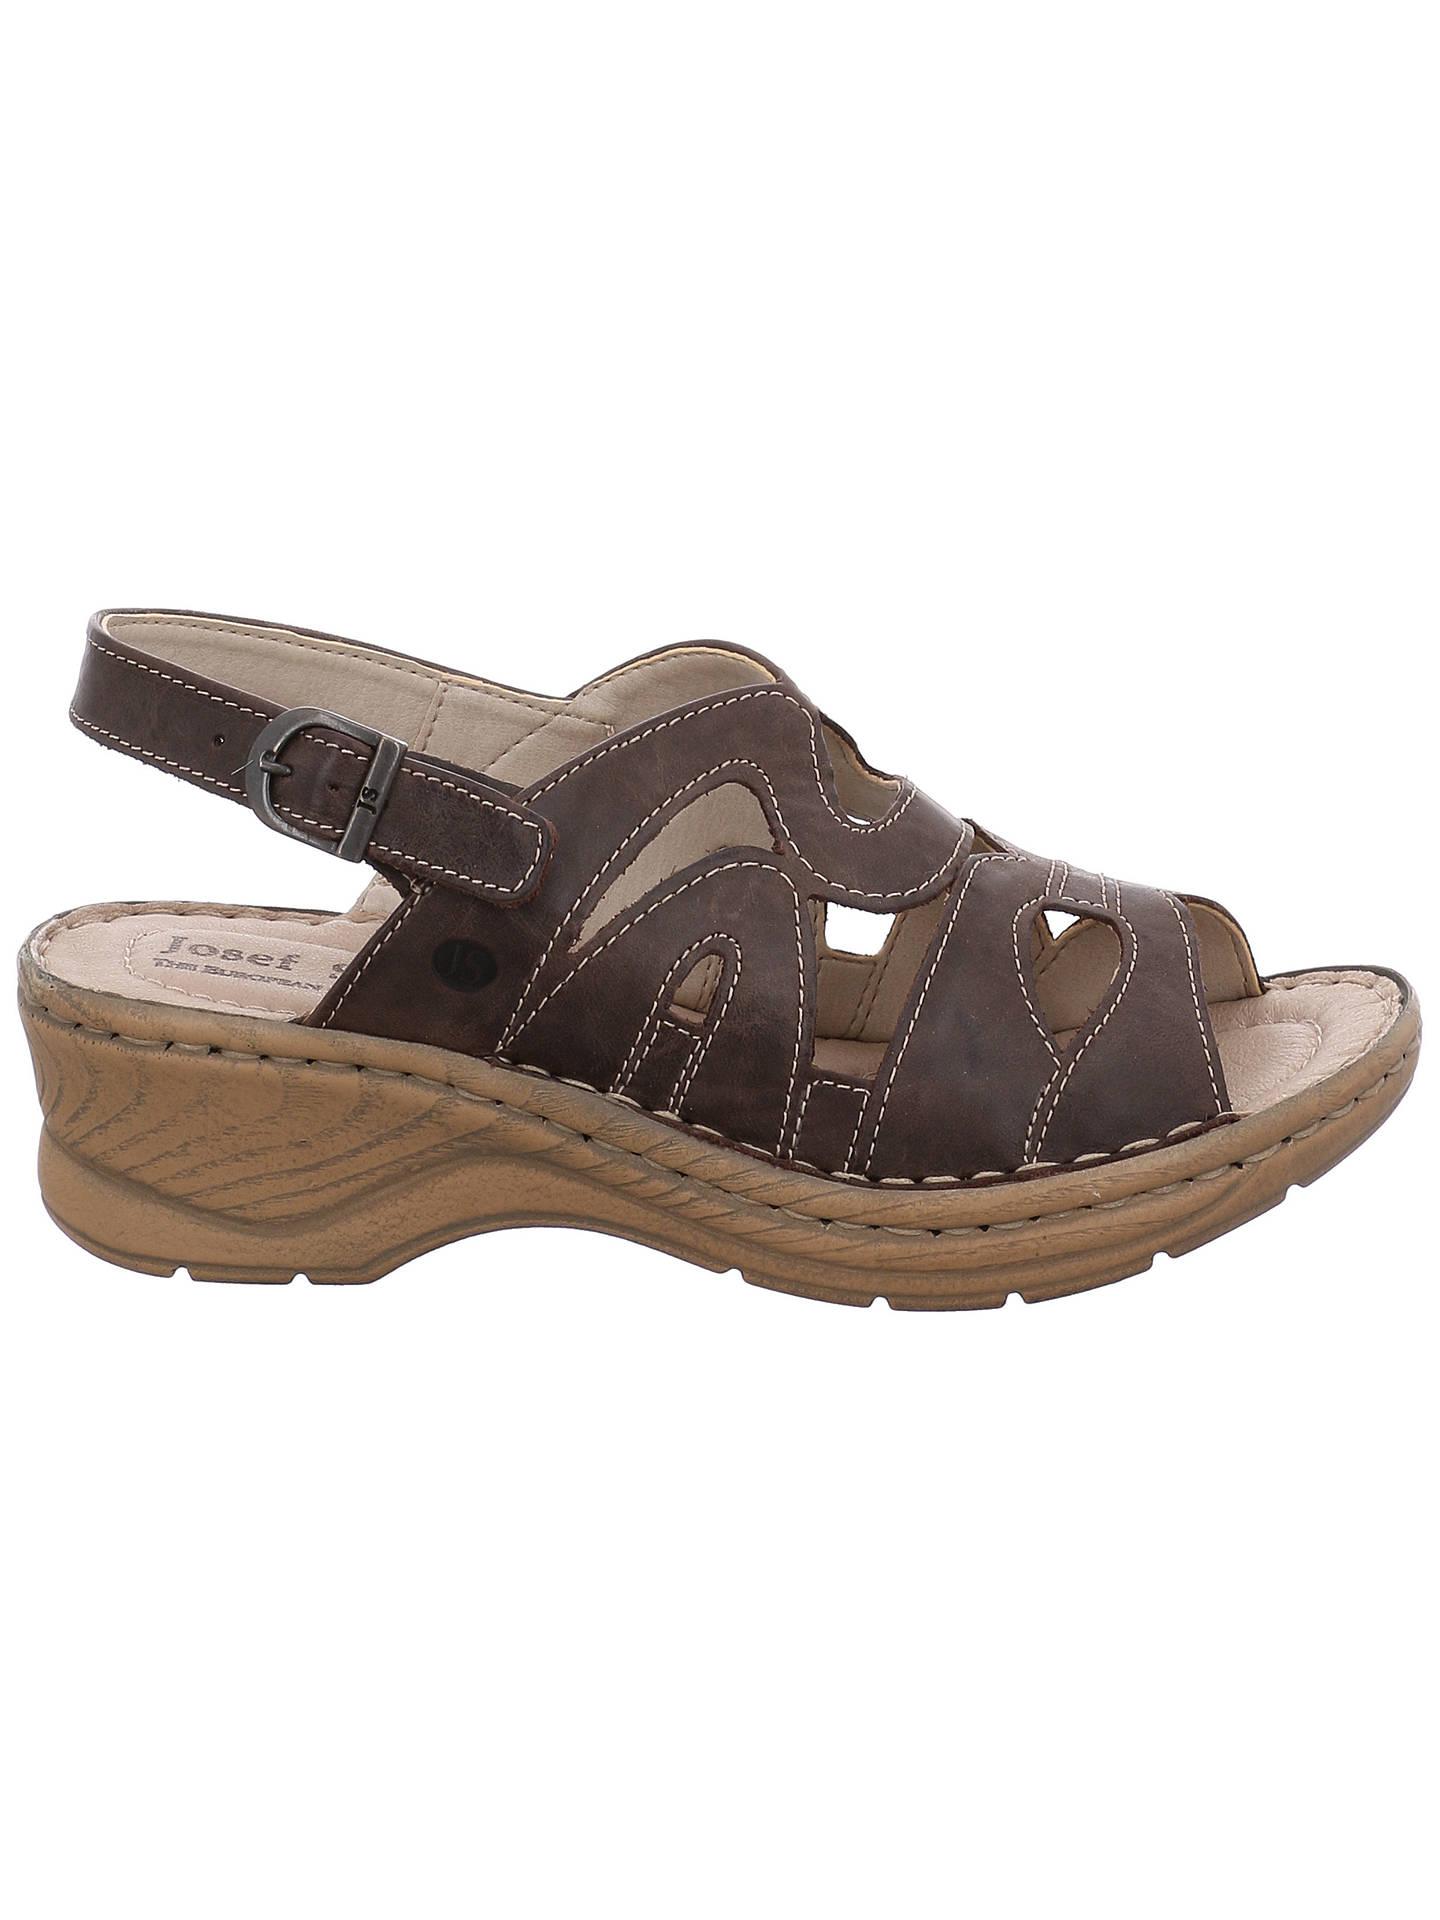 4f32a288f49 ... Buy Josef Seibel Catalonia 46 Slingback Sandals